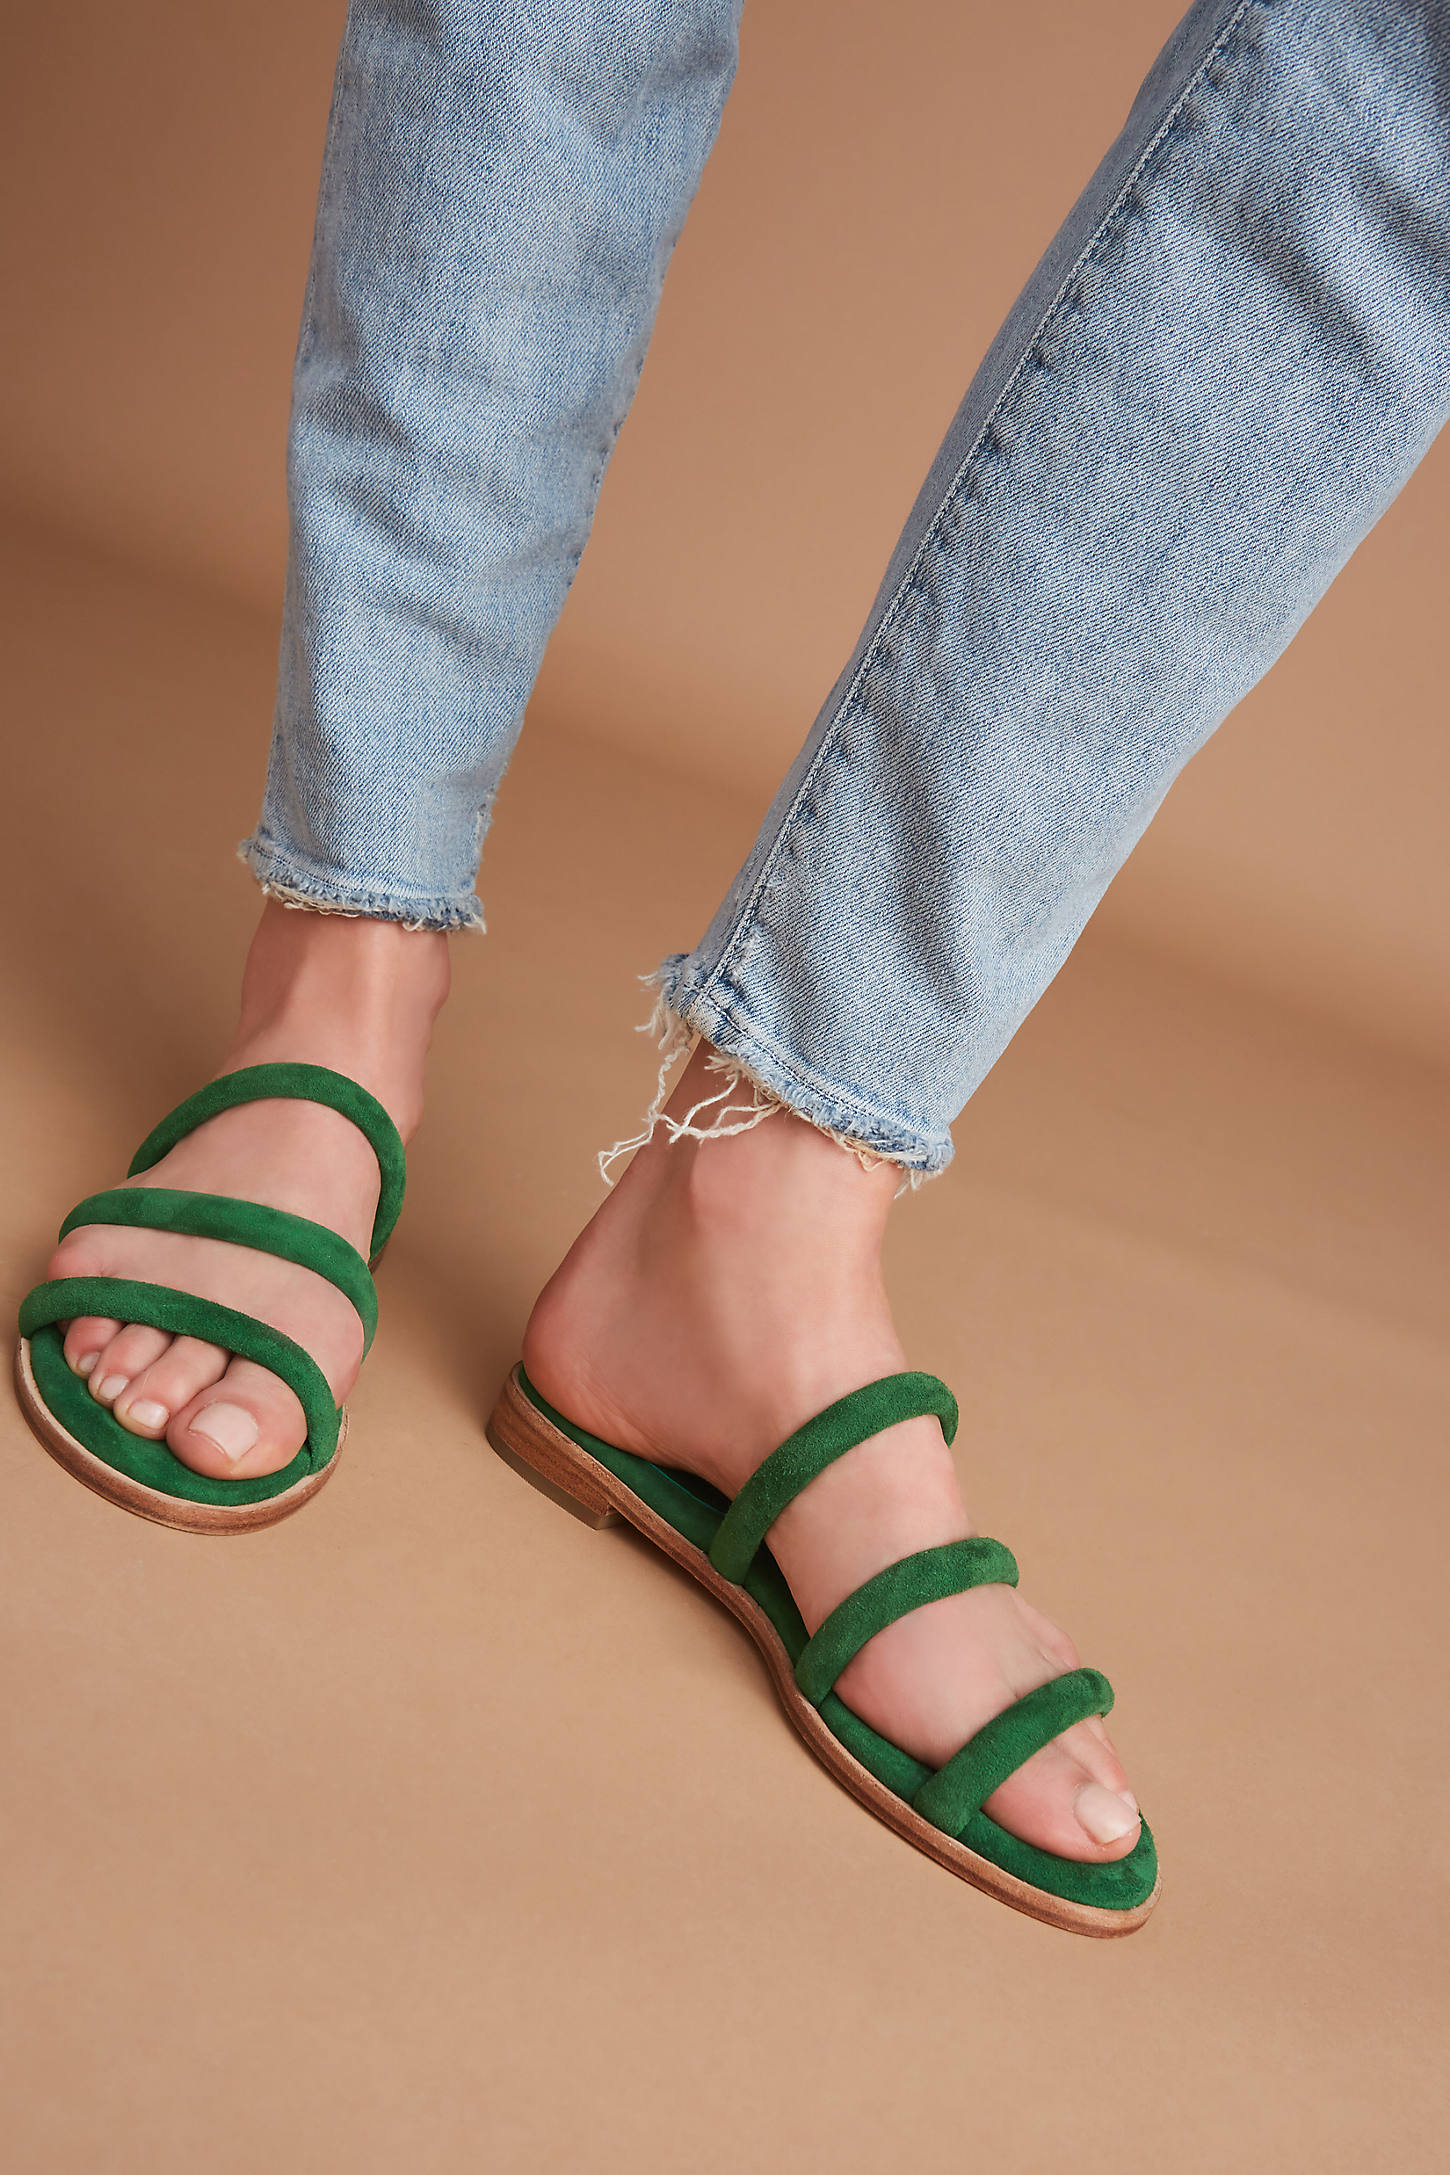 Charlotte Stone Bruna Slide Sandals